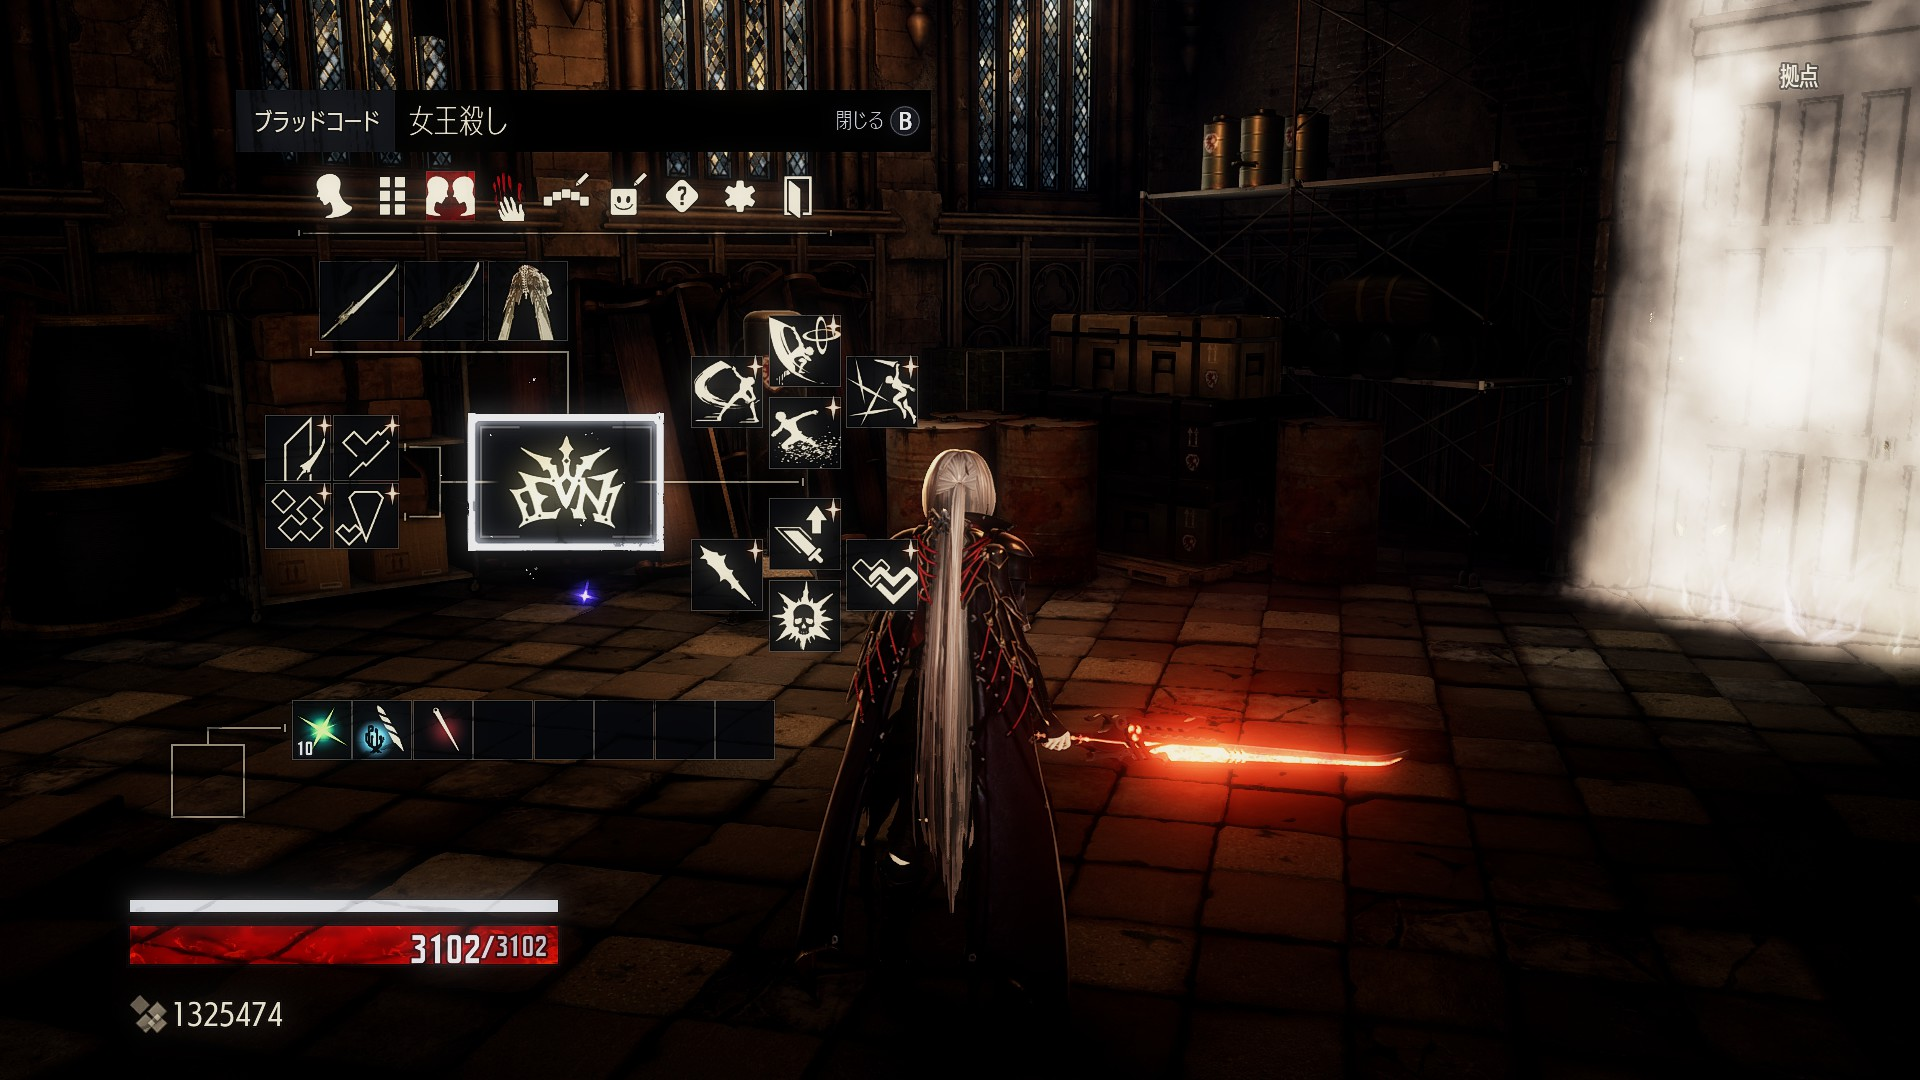 [PCゲーム]CODE VEIN:高難易度モードを楽しもう2